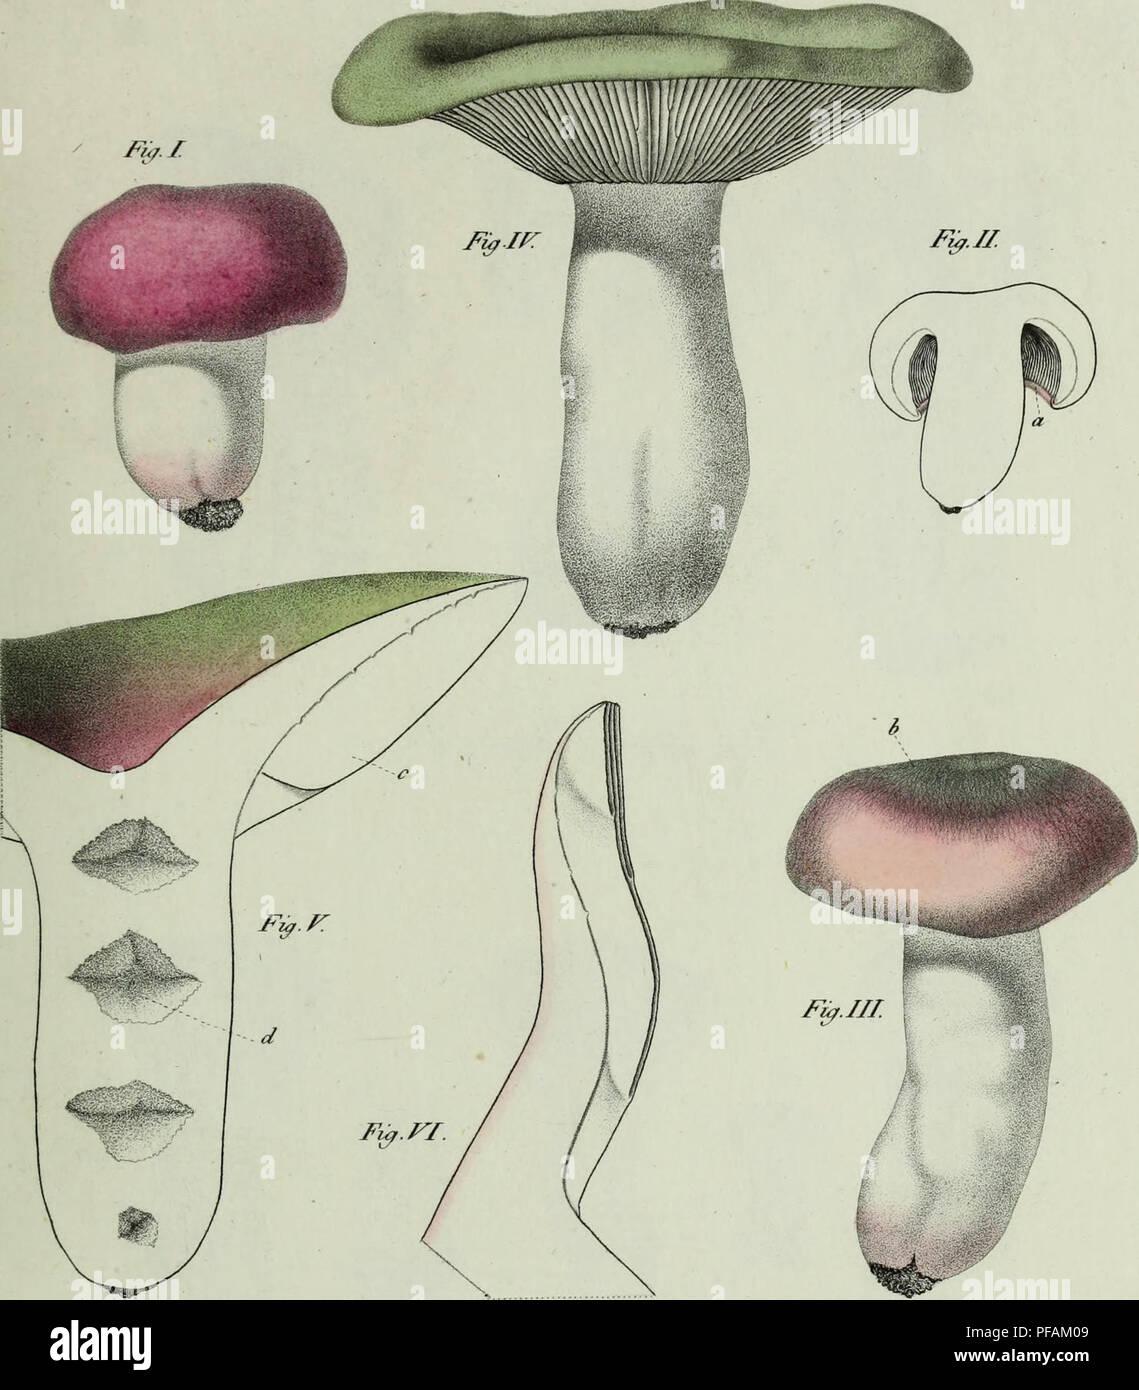 . Descrizione dei funghi mangerecci più comuni dell'Italia e de' velenosi che possono co' medesimi confondersi. Fungi; Mushrooms. ù â A J Txxvu.. v   ^H&i ^> â f^i/Tii/ùtii e,Y rutterà . r ( /7/W6&6/ n^6^-/l/l(/{UlJ tjfy:. Please note that these images are extracted from scanned page images that may have been digitally enhanced for readability - coloration and appearance of these illustrations may not perfectly resemble the original work.. Vittadini, Carlo; Cavagna Sangiuliani di Gualdana, Antonio, conte, 1843-1913, former owner. IU-R. Milano, Rusconi - Stock Image